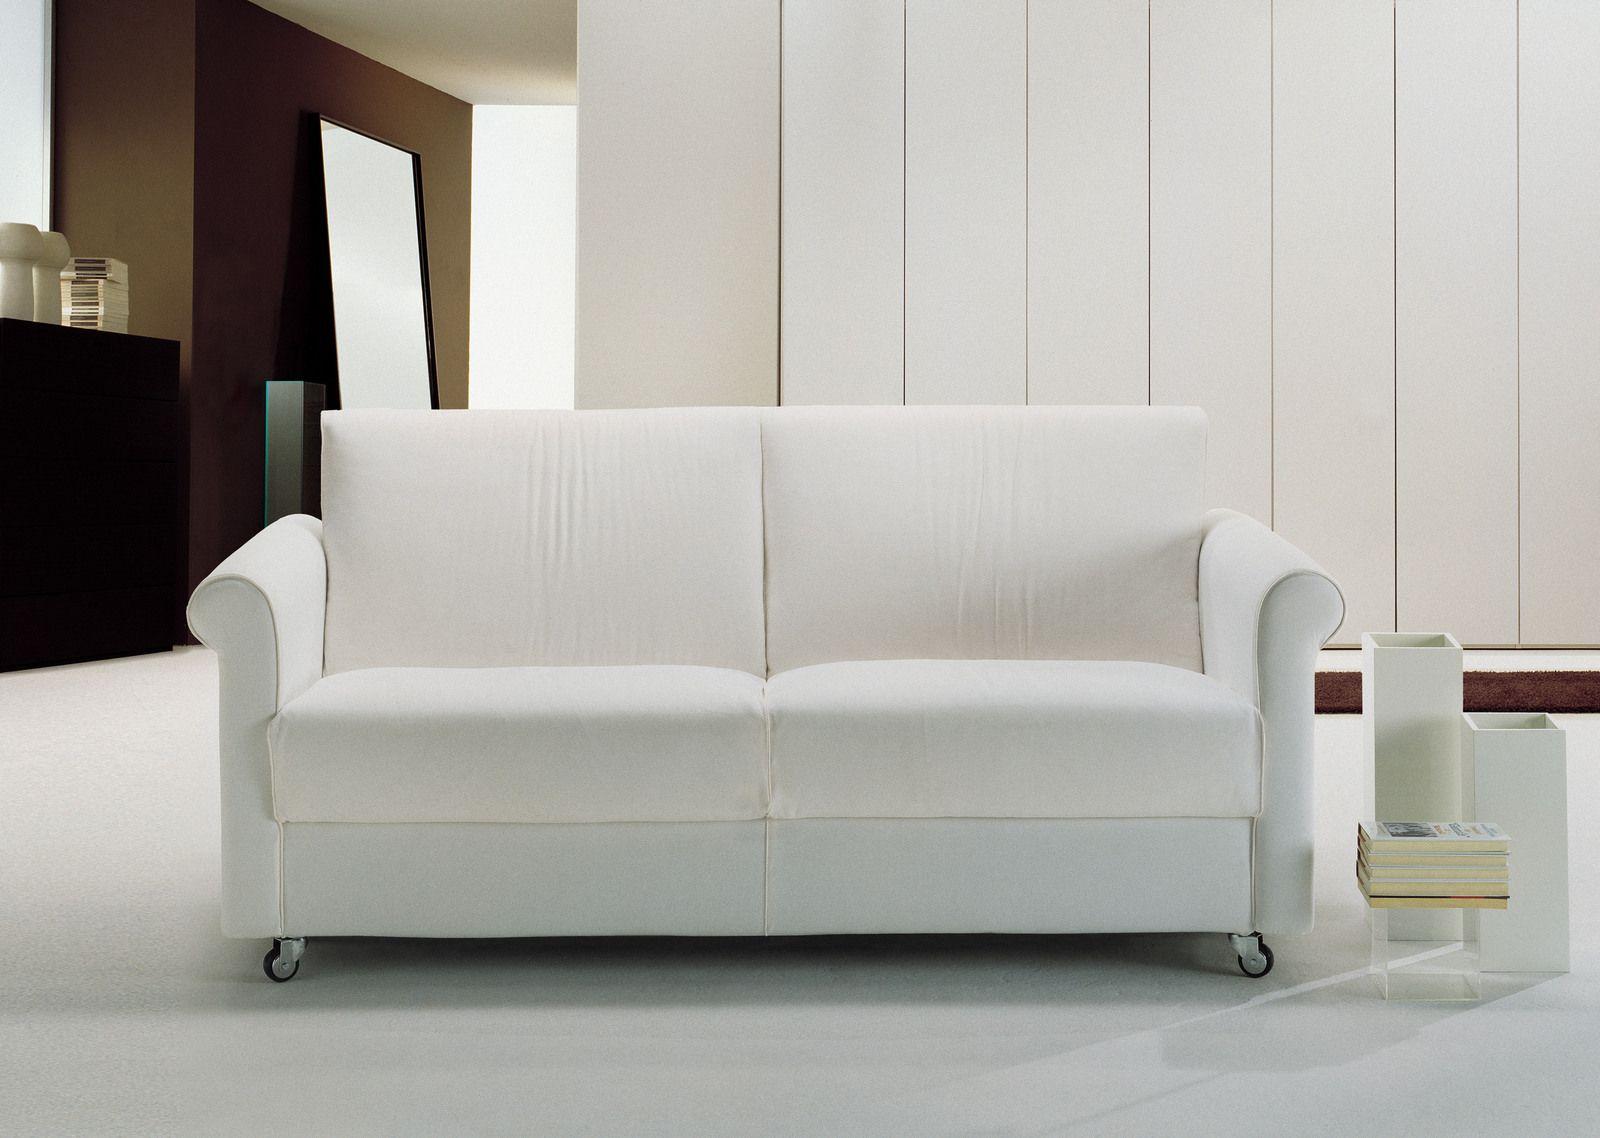 canap lit convertible 2 places merlino by bodema design studio r e s. Black Bedroom Furniture Sets. Home Design Ideas